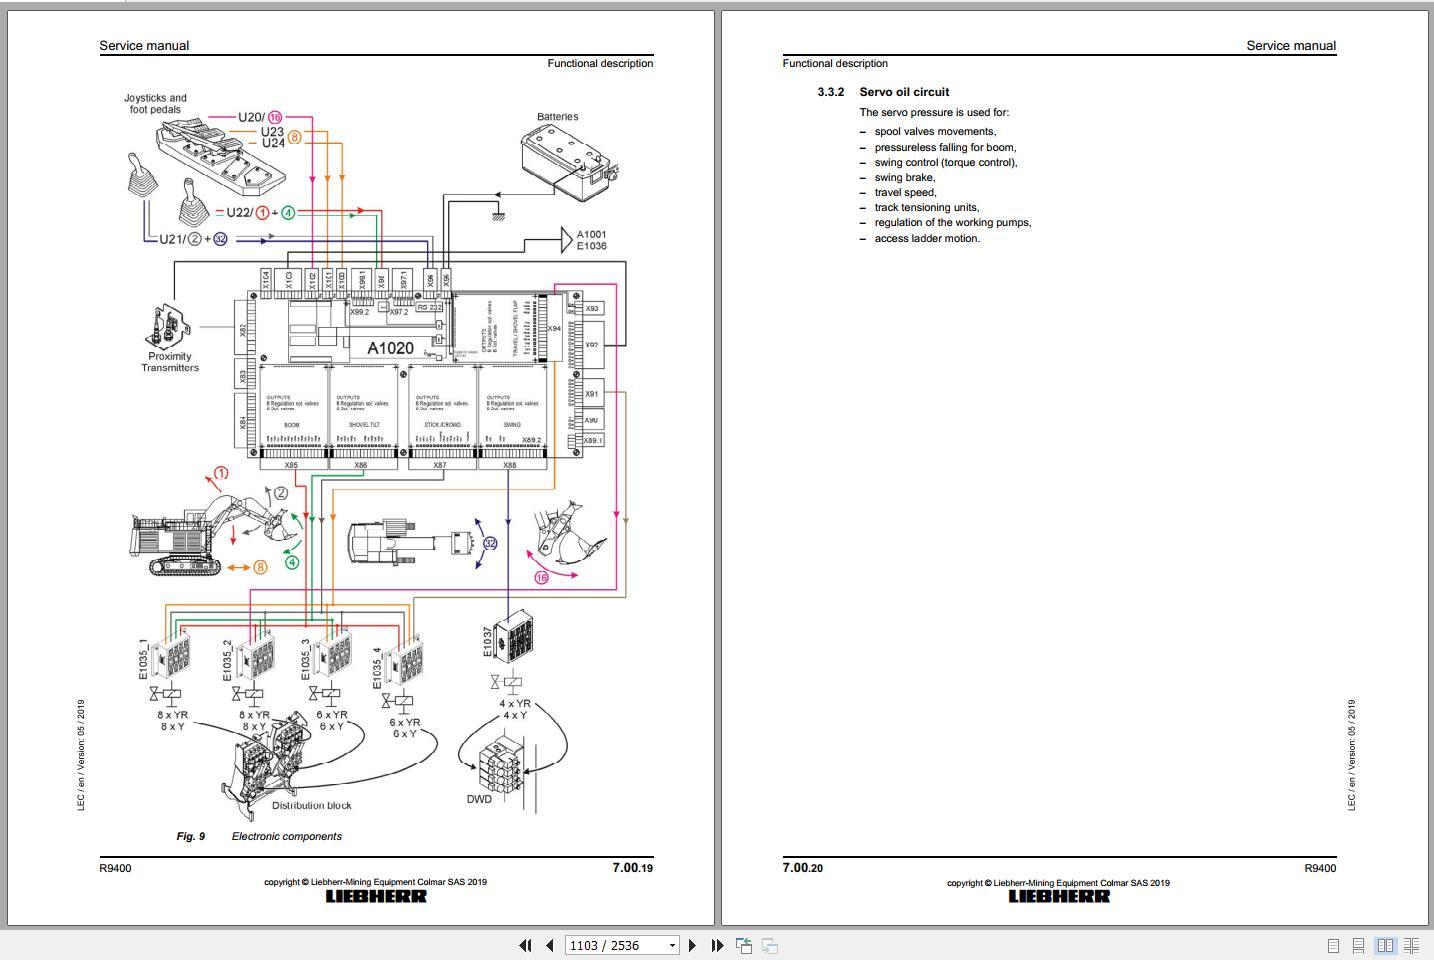 Liebherr_Mining_Excavators_Service_Manual_New_Updated_032020_26